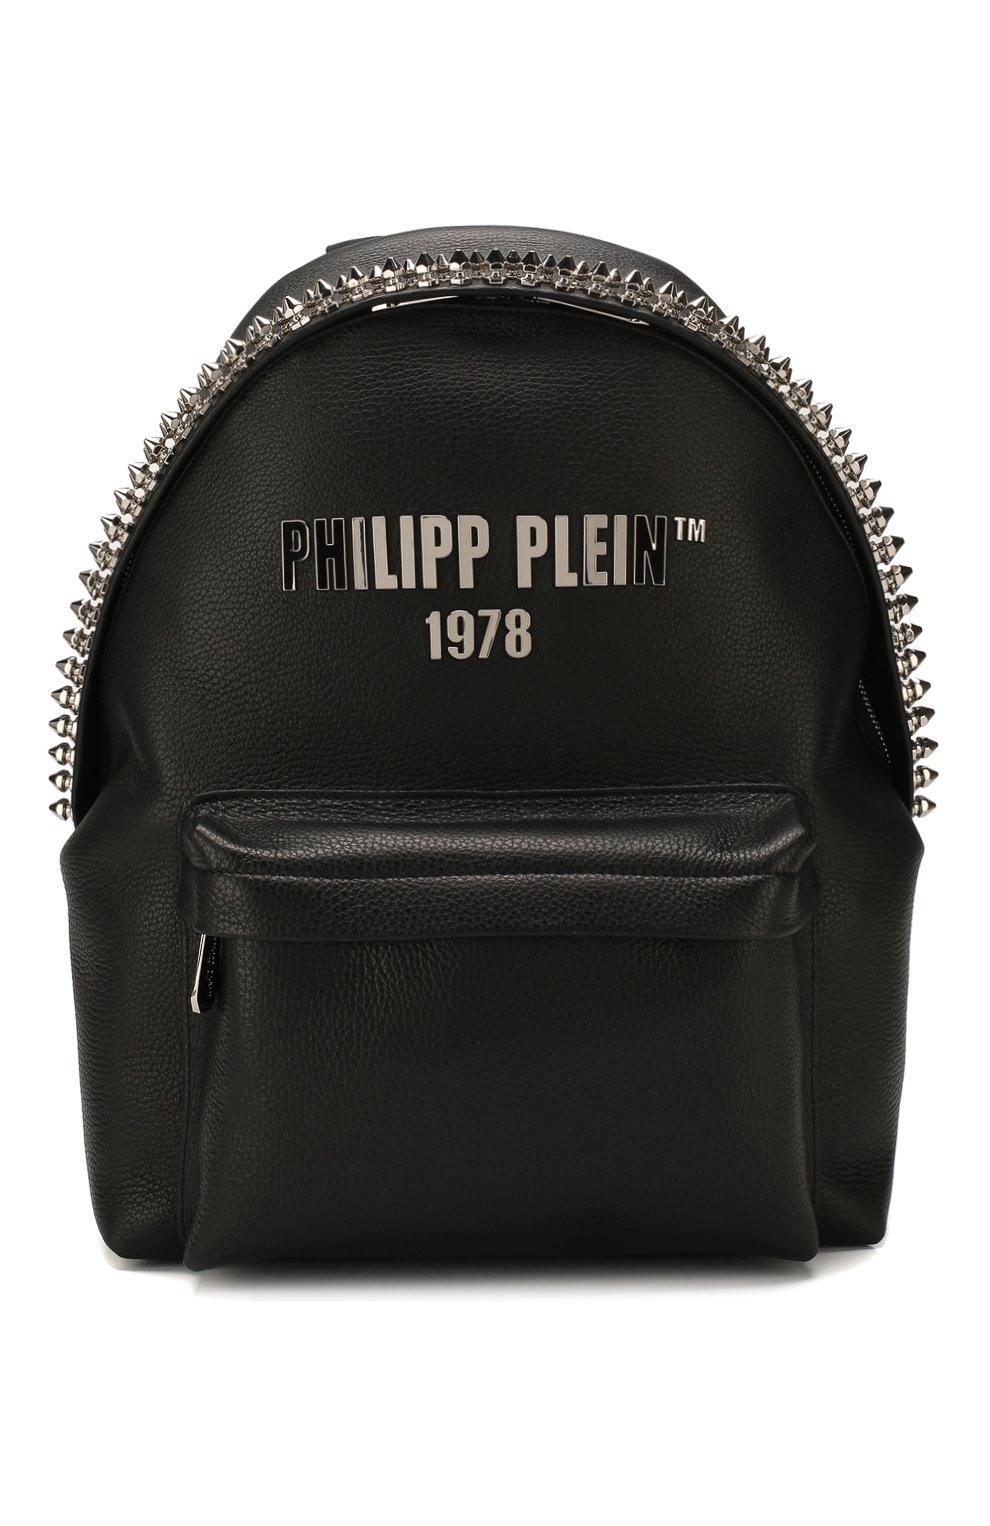 Мужской кожаный рюкзак PHILIPP PLEIN черного цвета, арт. S20A MBA0887 PLE053N | Фото 1